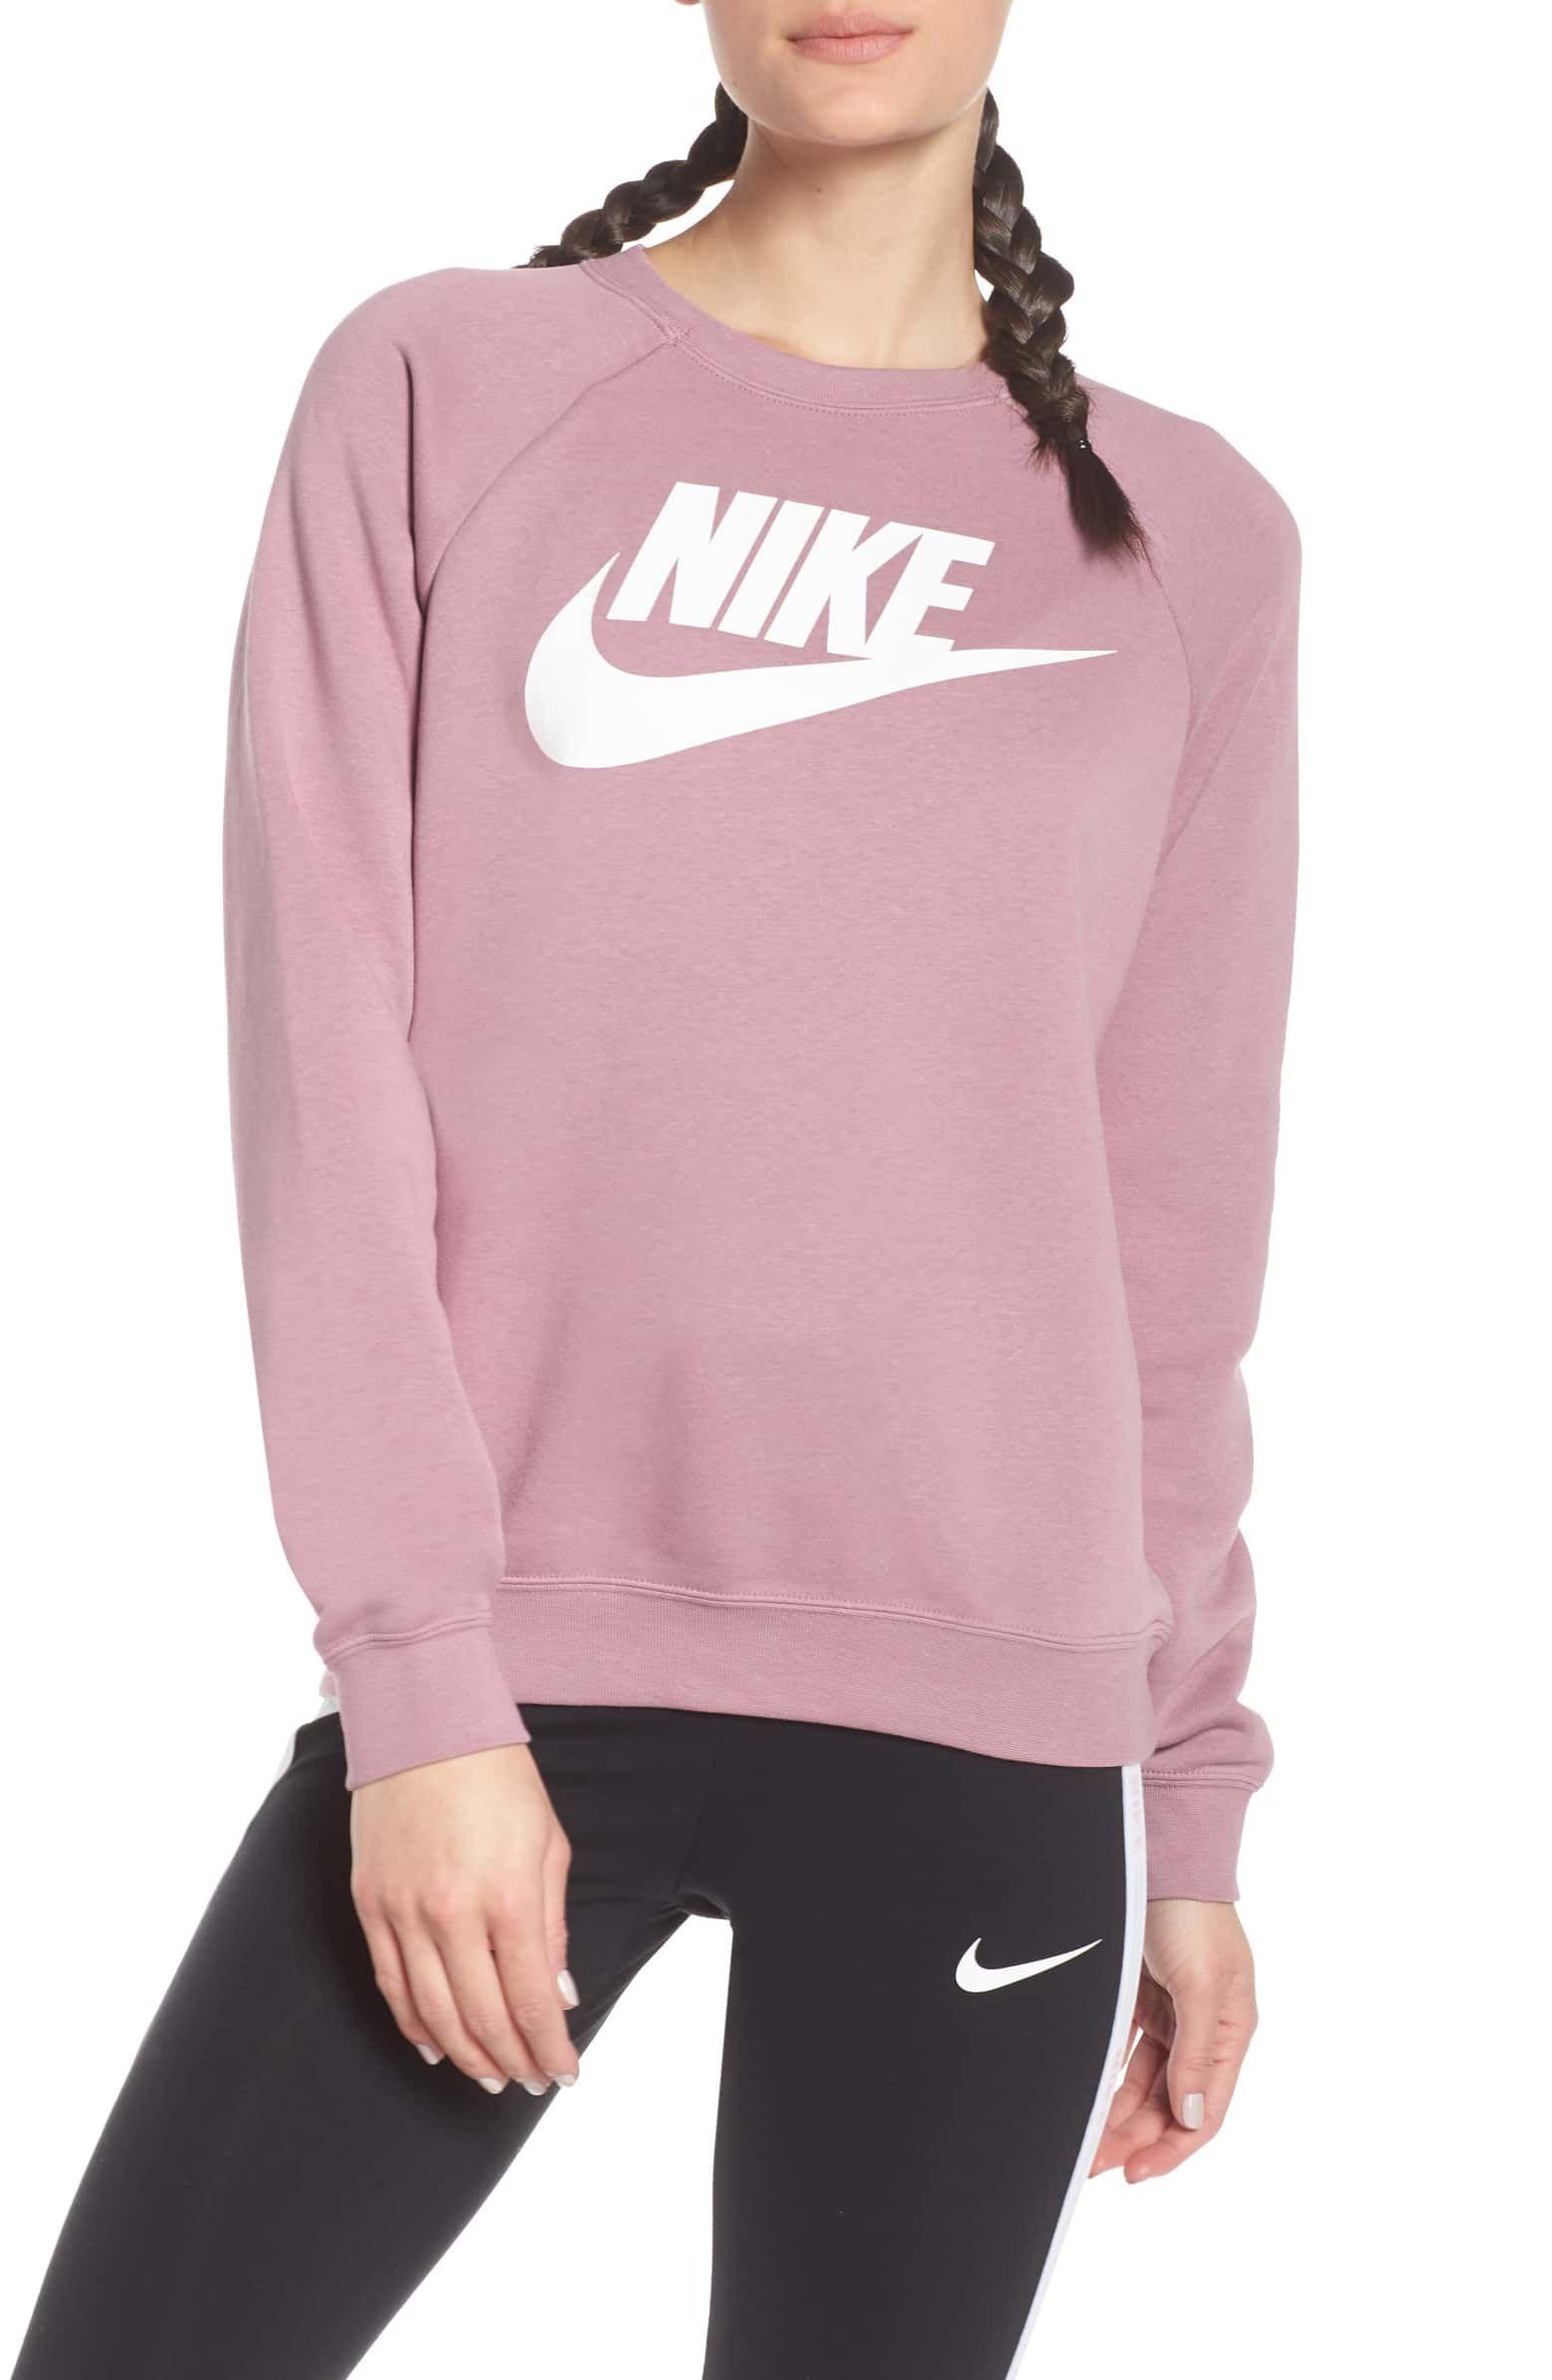 Nike Nsw Rally Sweatshirt Nordstrom High Fashion Street Style Summer Fashion Outfits Casual Sweatshirts [ 2392 x 1560 Pixel ]